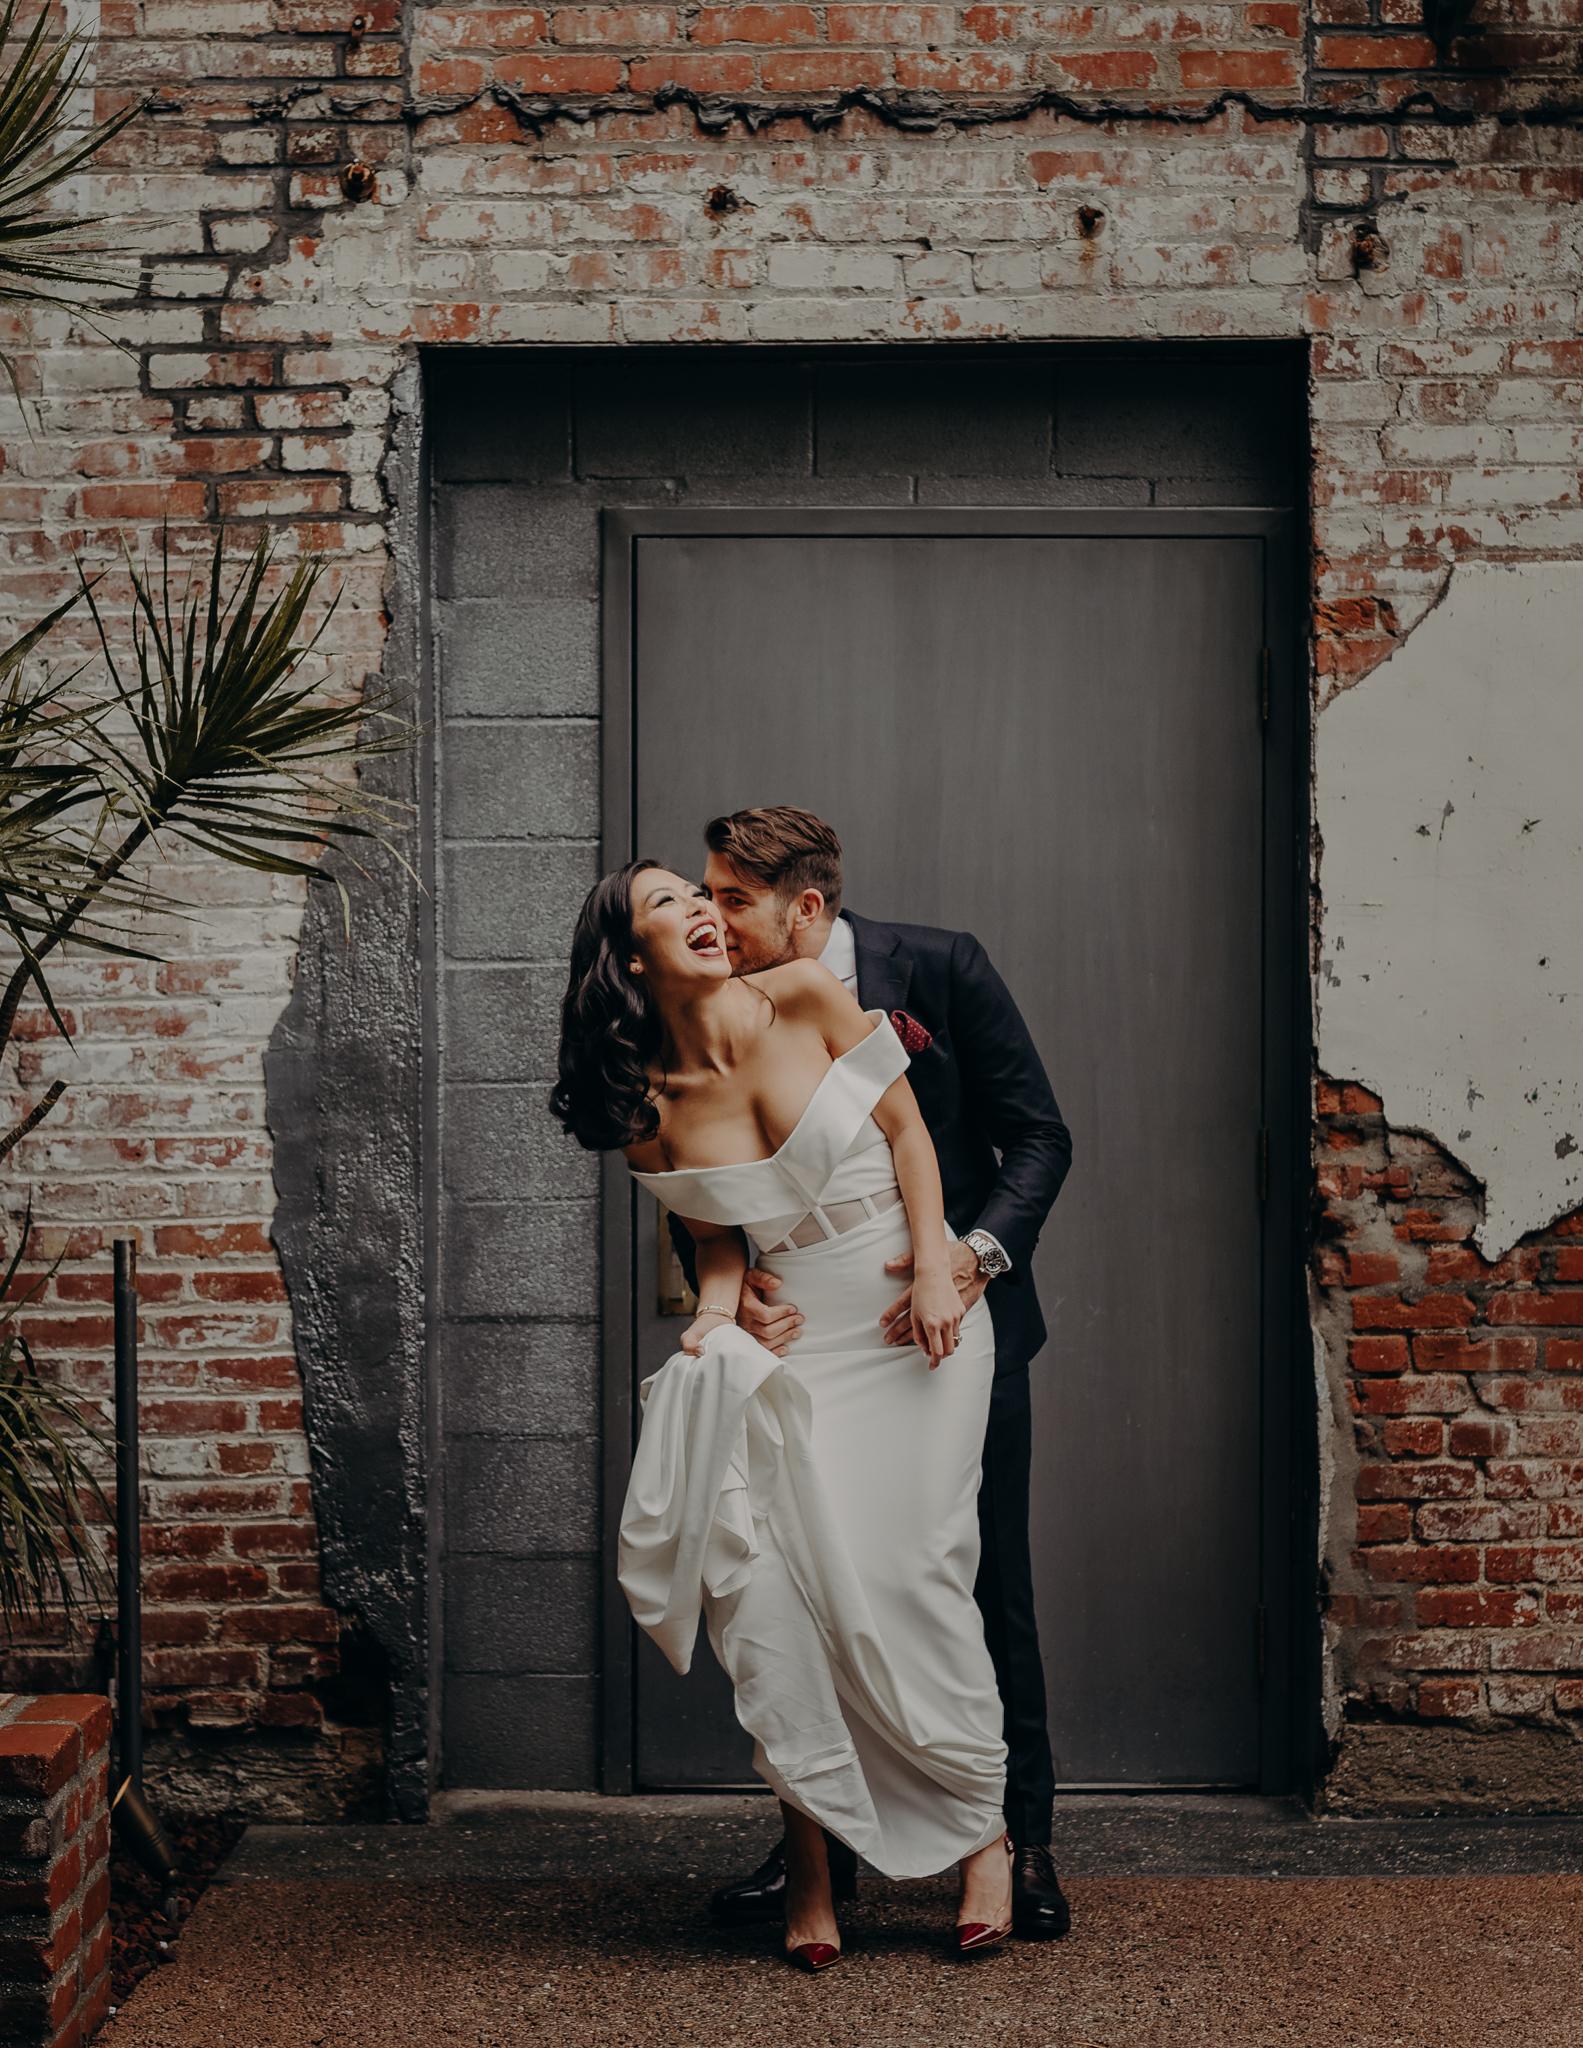 Wedding Photo LA - wedding photographer in los angeles - millwick wedding venue -isaiahandtaylor.com-053.jpg